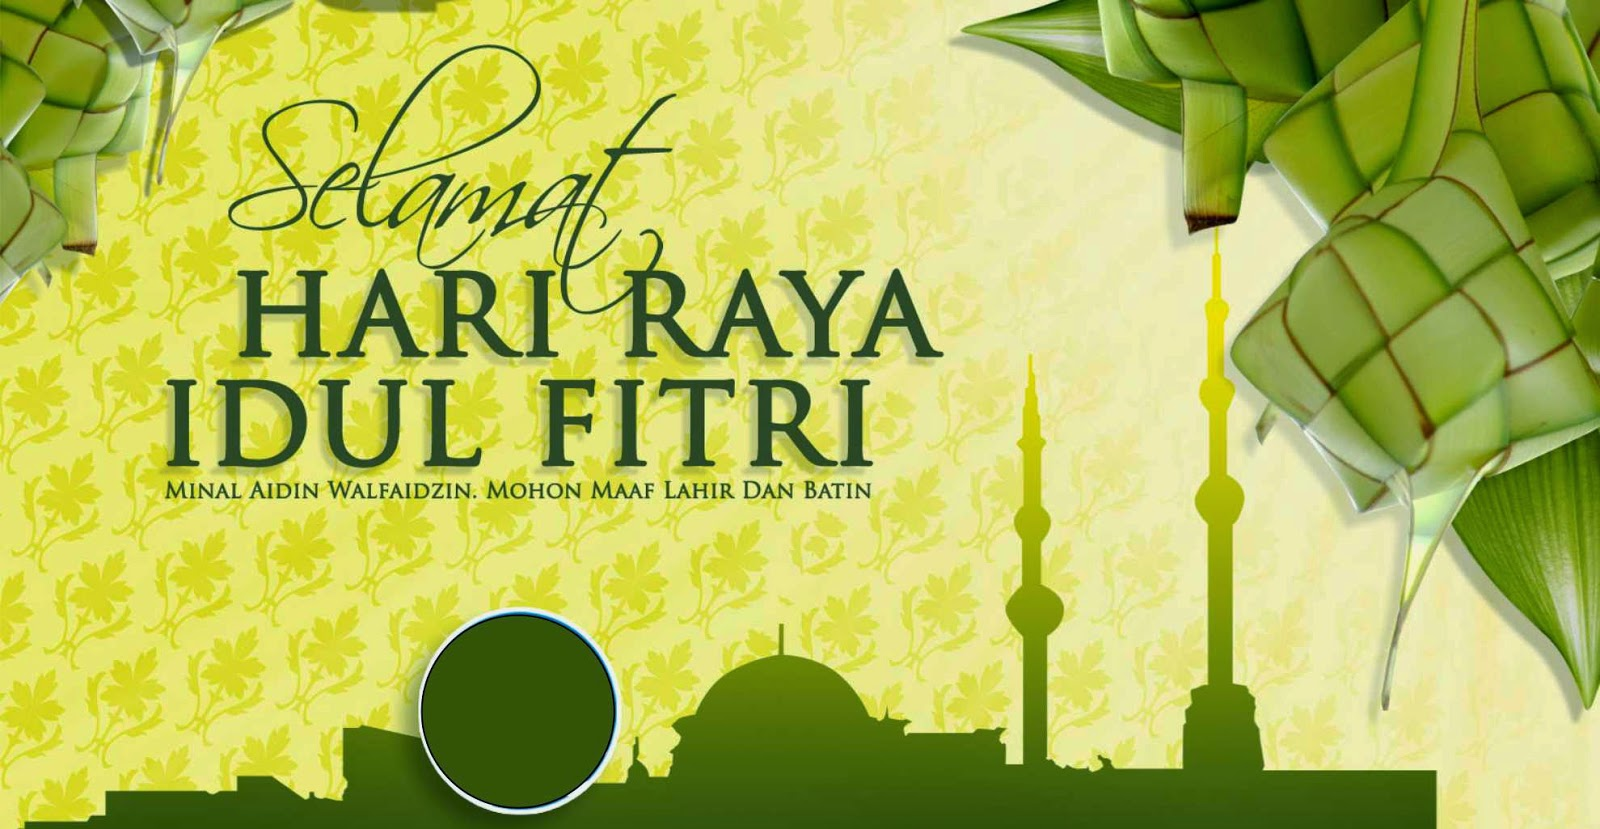 Wallpaper Selamat Idul Fitri